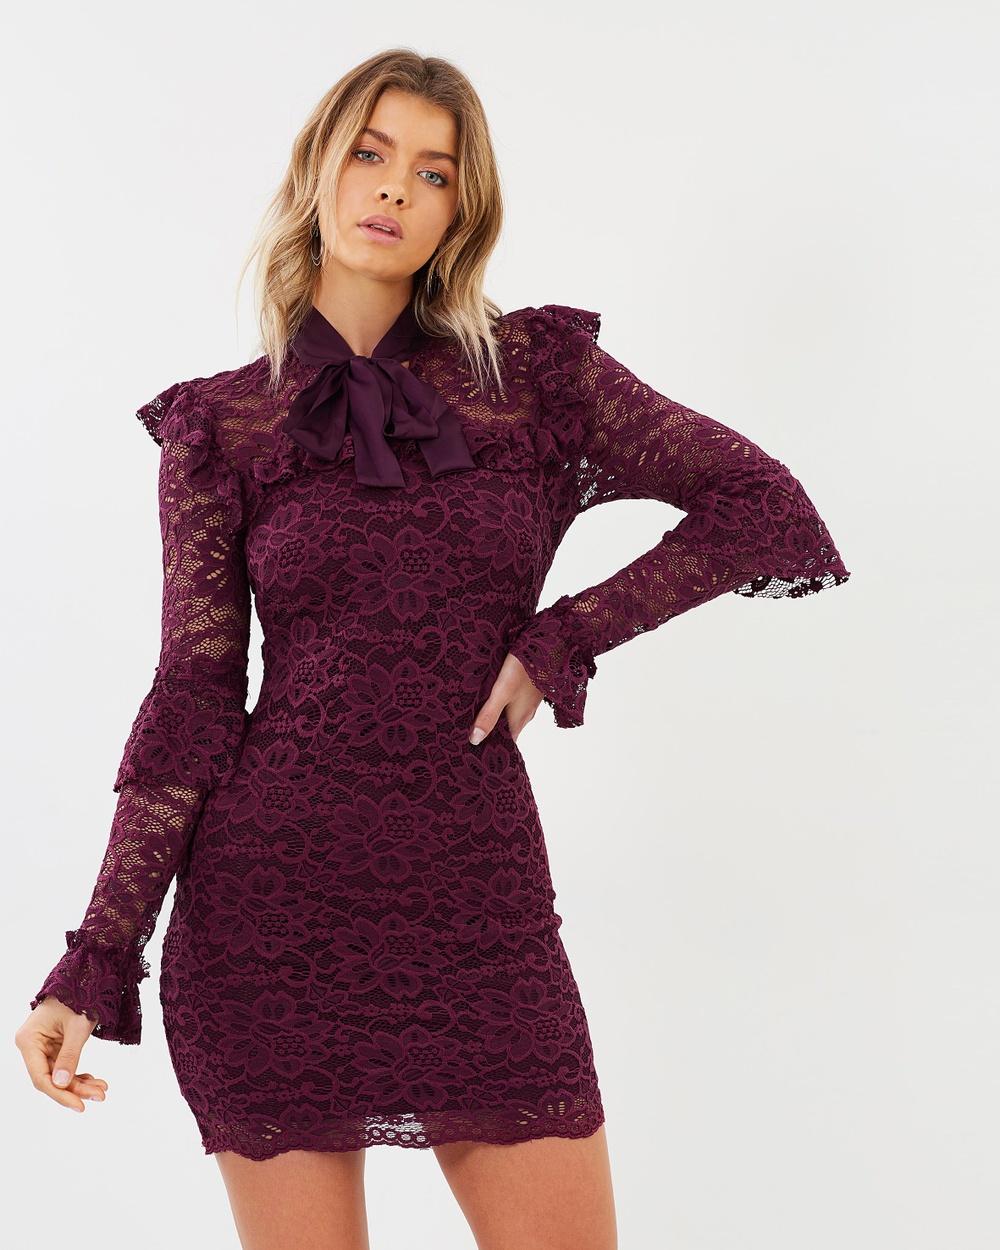 Pasduchas Winsome Dress Dresses Wine Winsome Dress